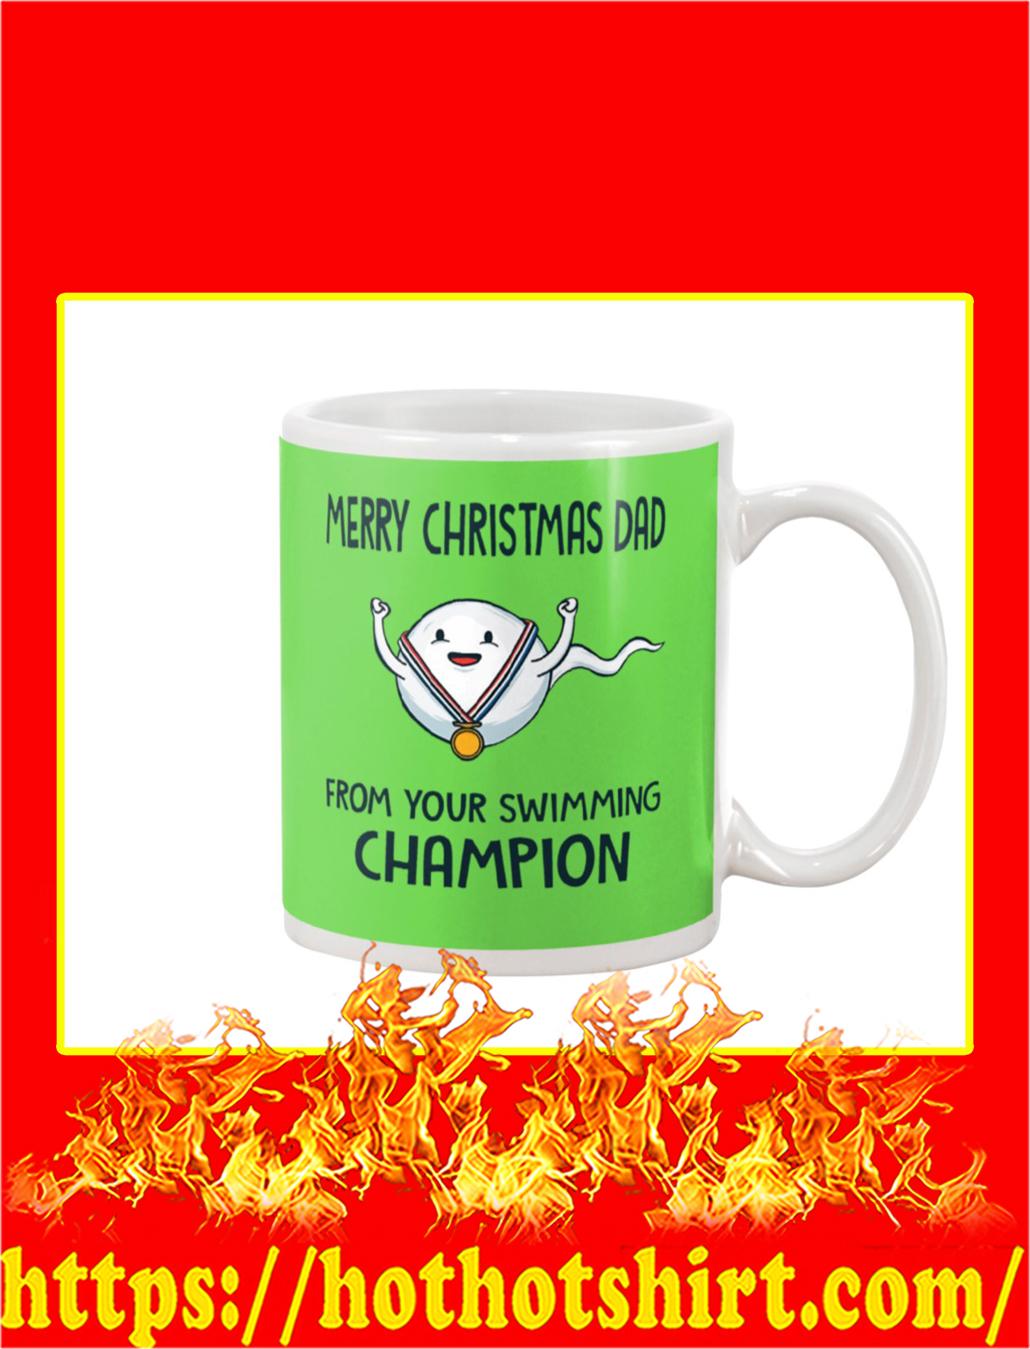 Merry Christmas Dad From Your Swimming Champion Mug- kiwi